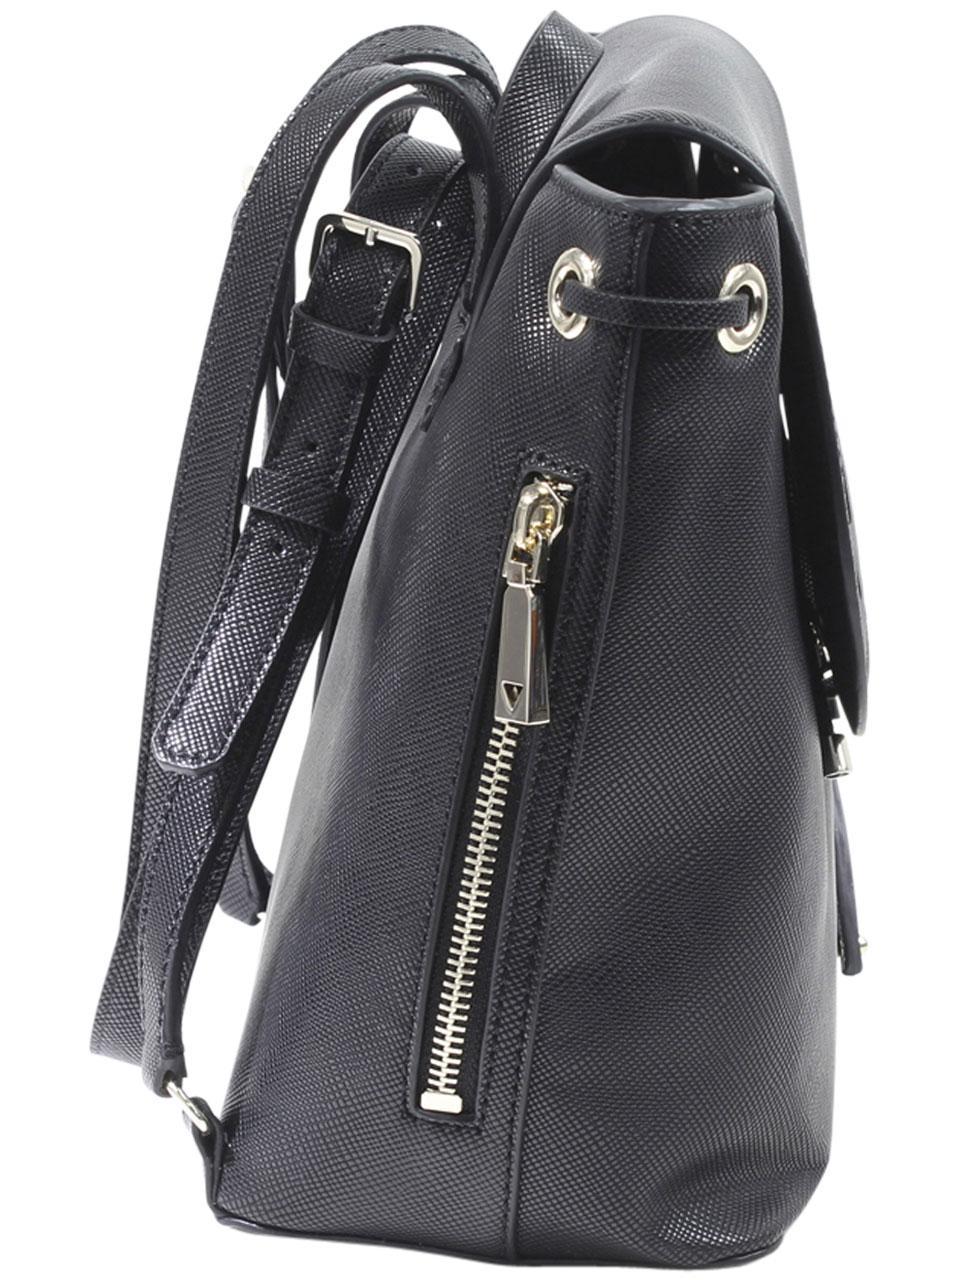 Guess-Women-039-s-Varsity-Pop-Pin-Up-Backpack-Bag thumbnail 7